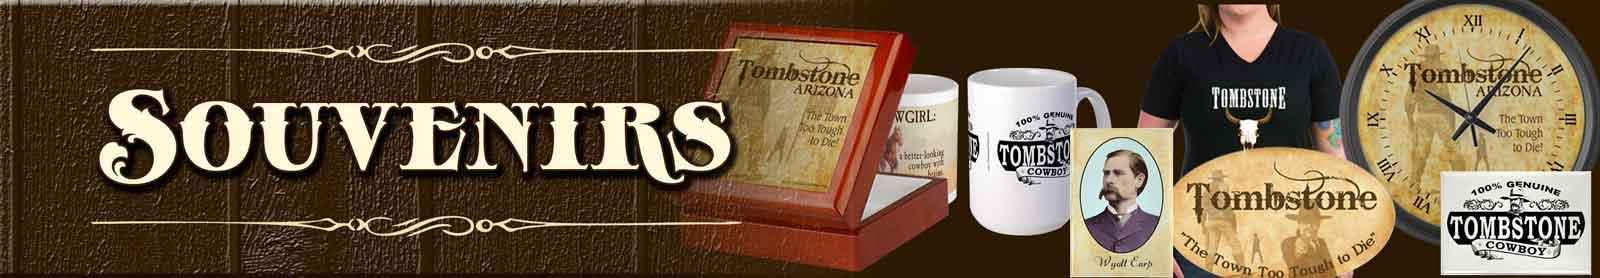 Tombstone Arizona Souvenirs